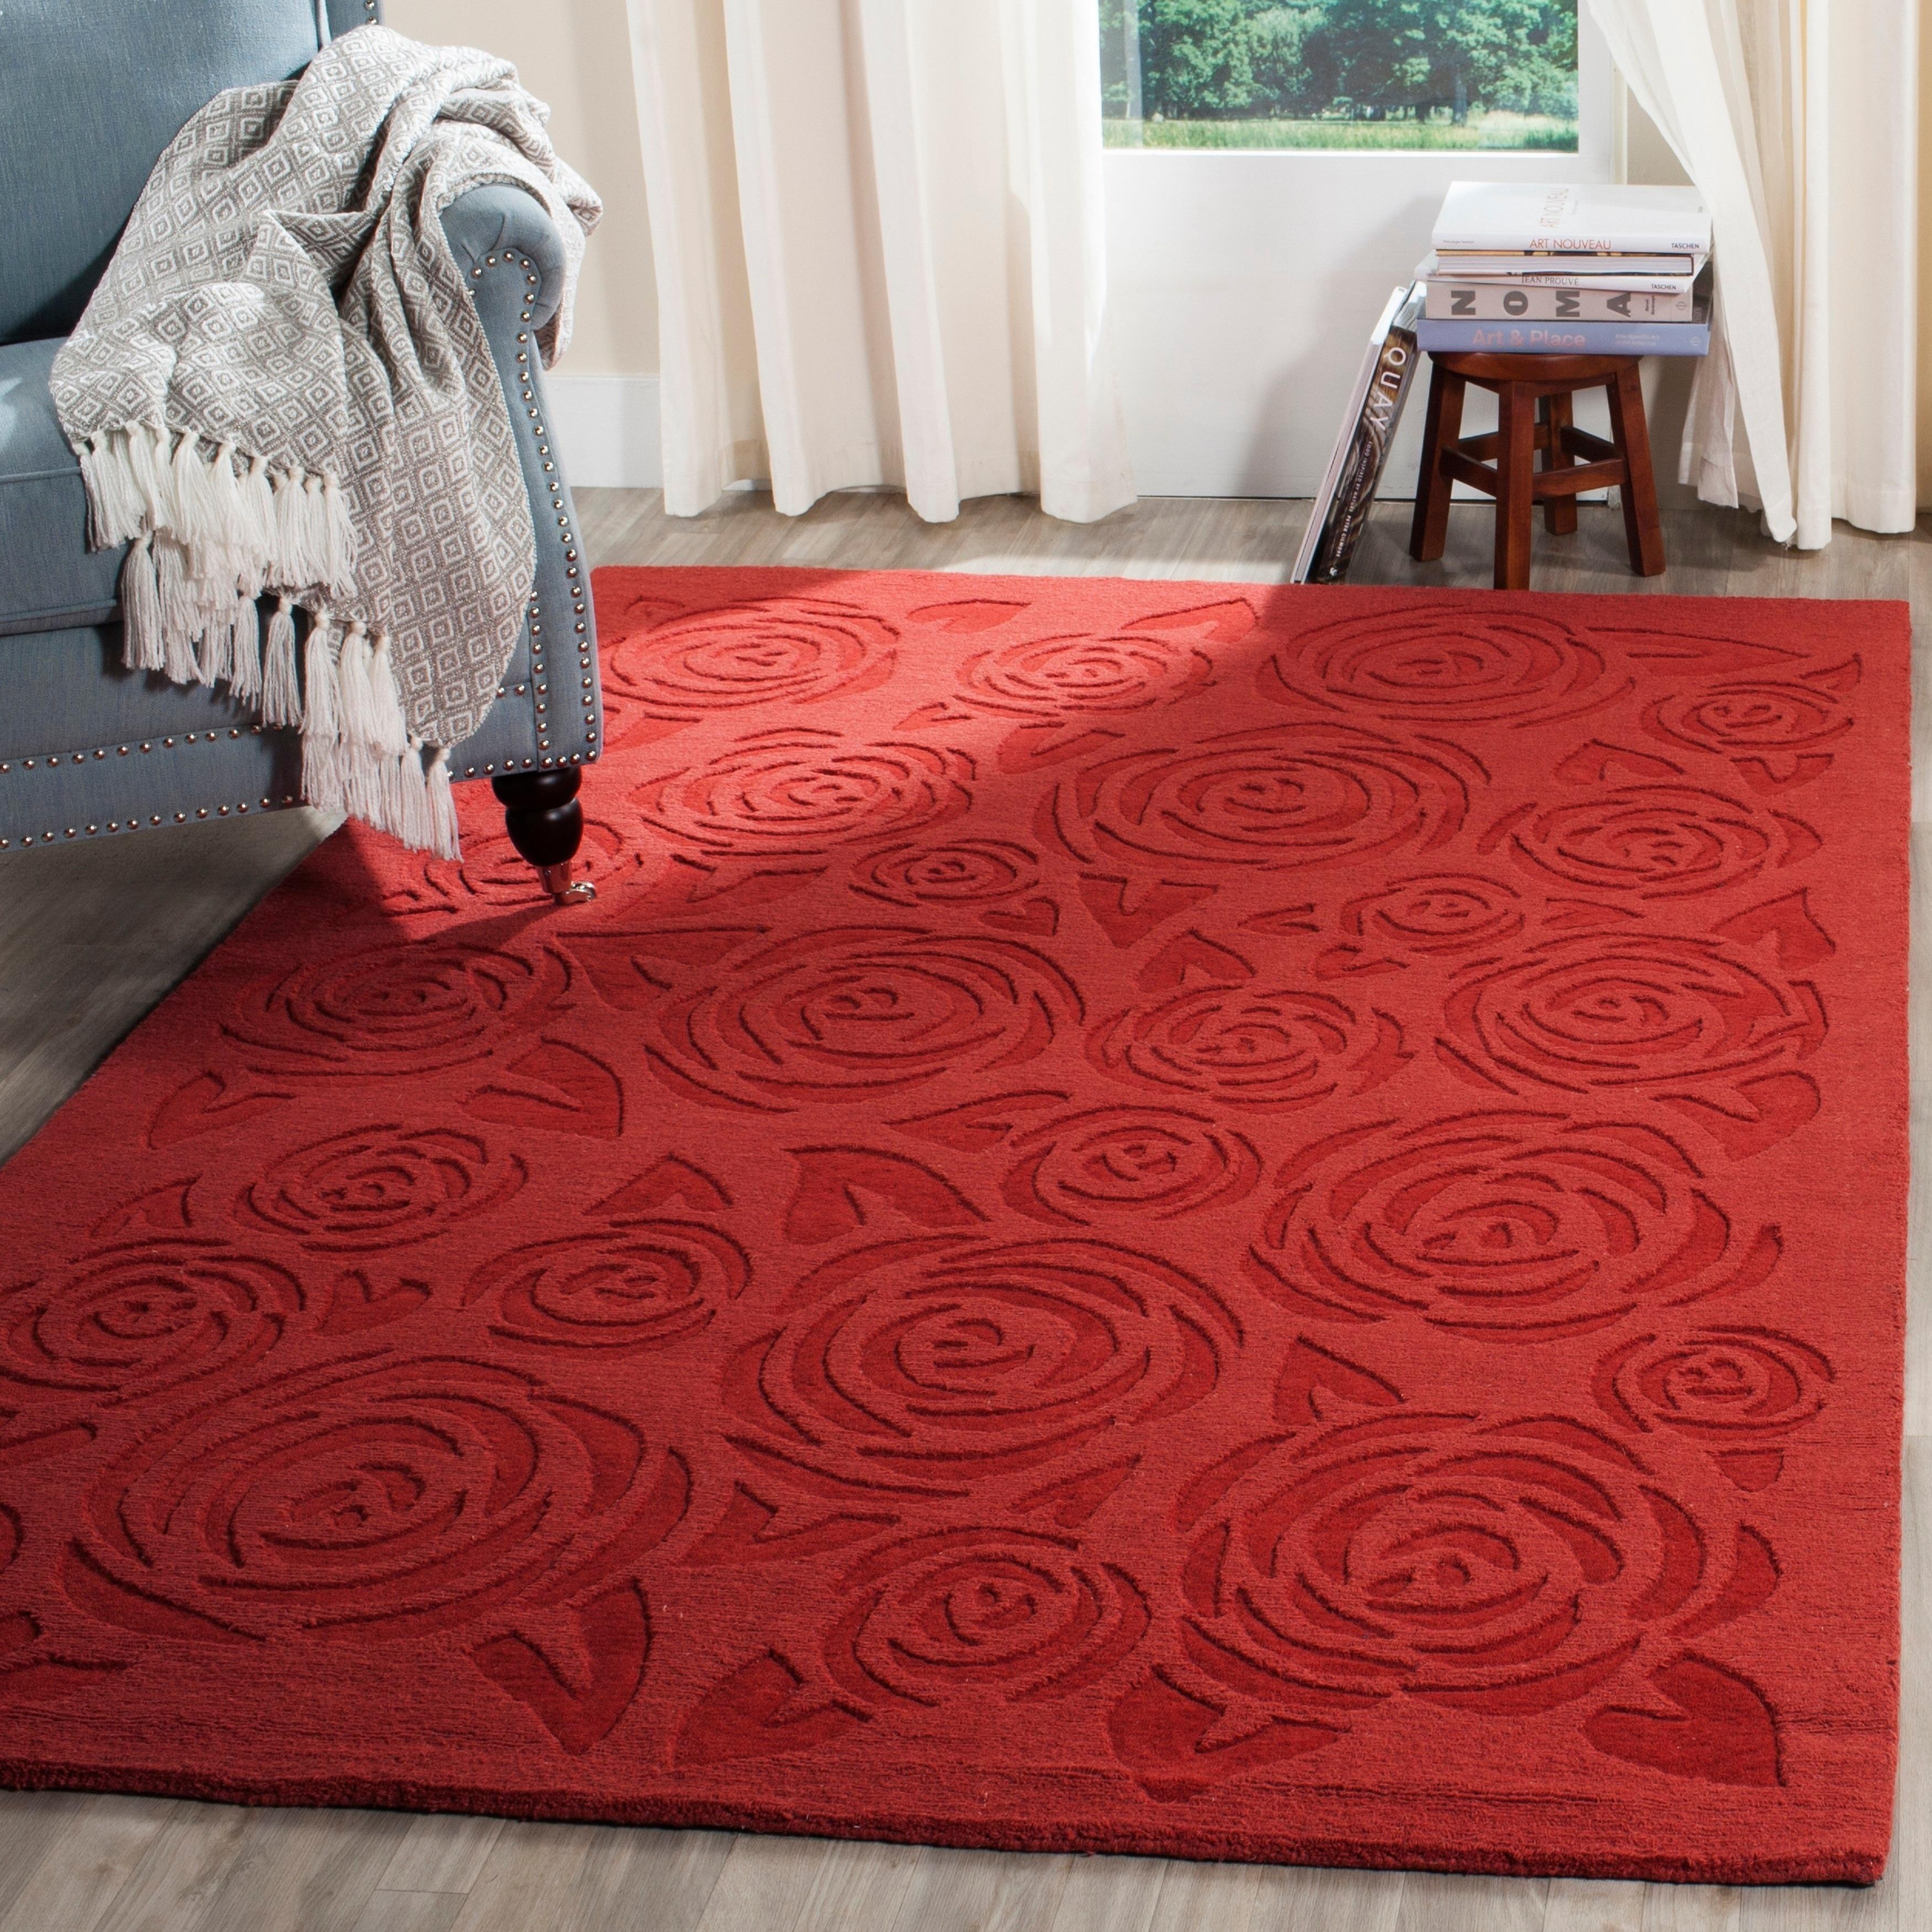 Safavieh Block Print Rose Wool Rug